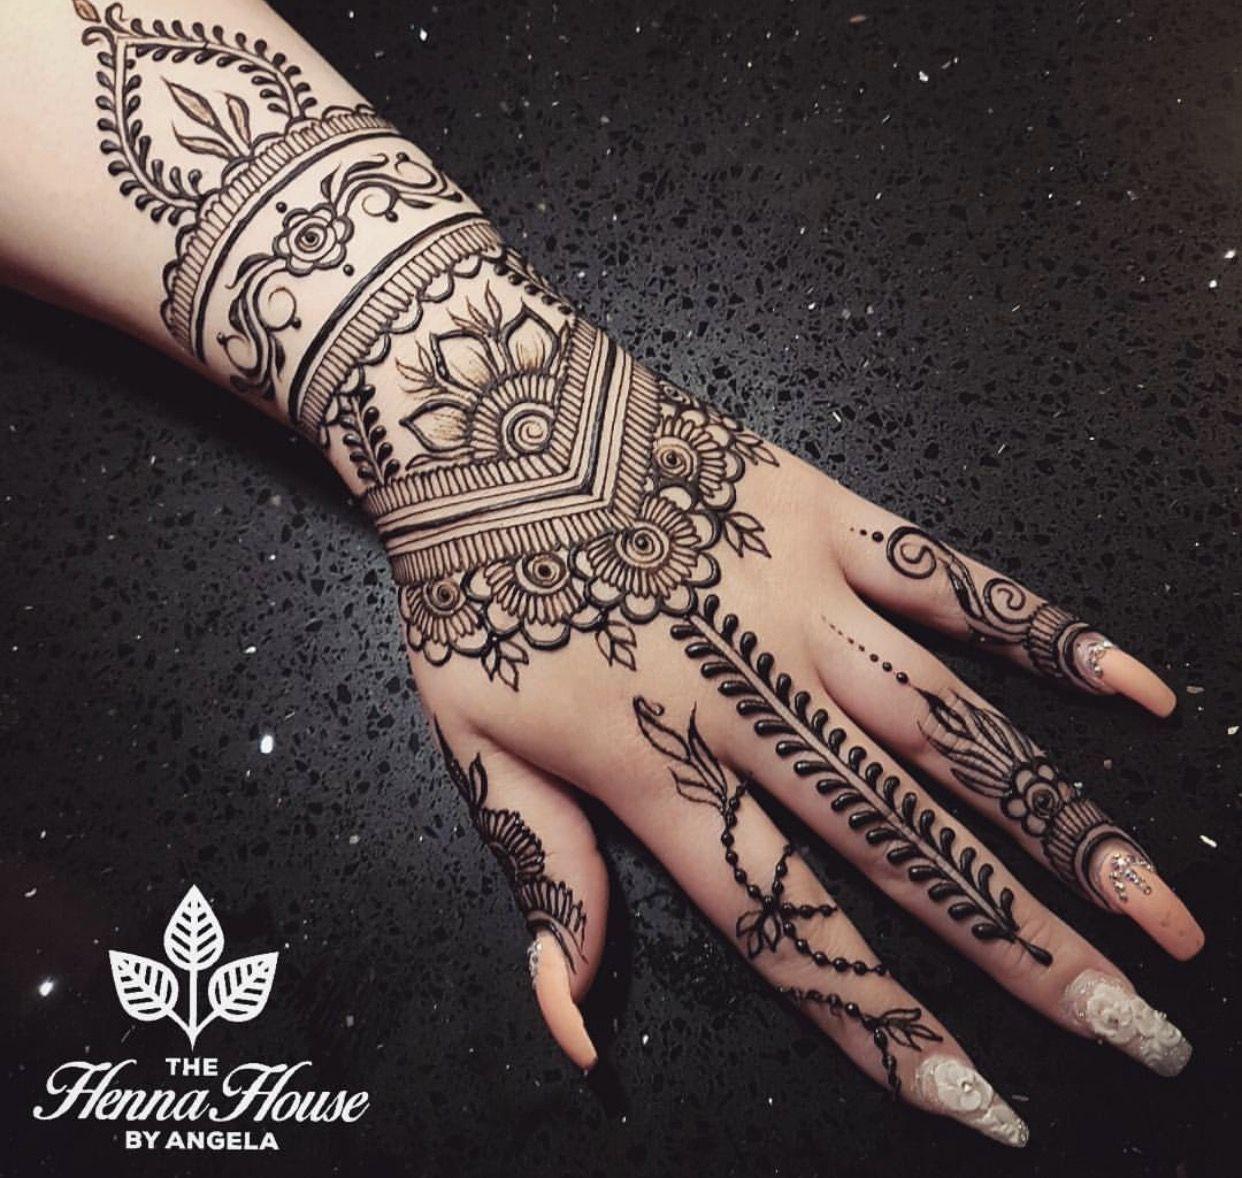 Pin By Raathey On Nail Art Henna Tattoo Hand Henna Tattoo Designs Henna Designs